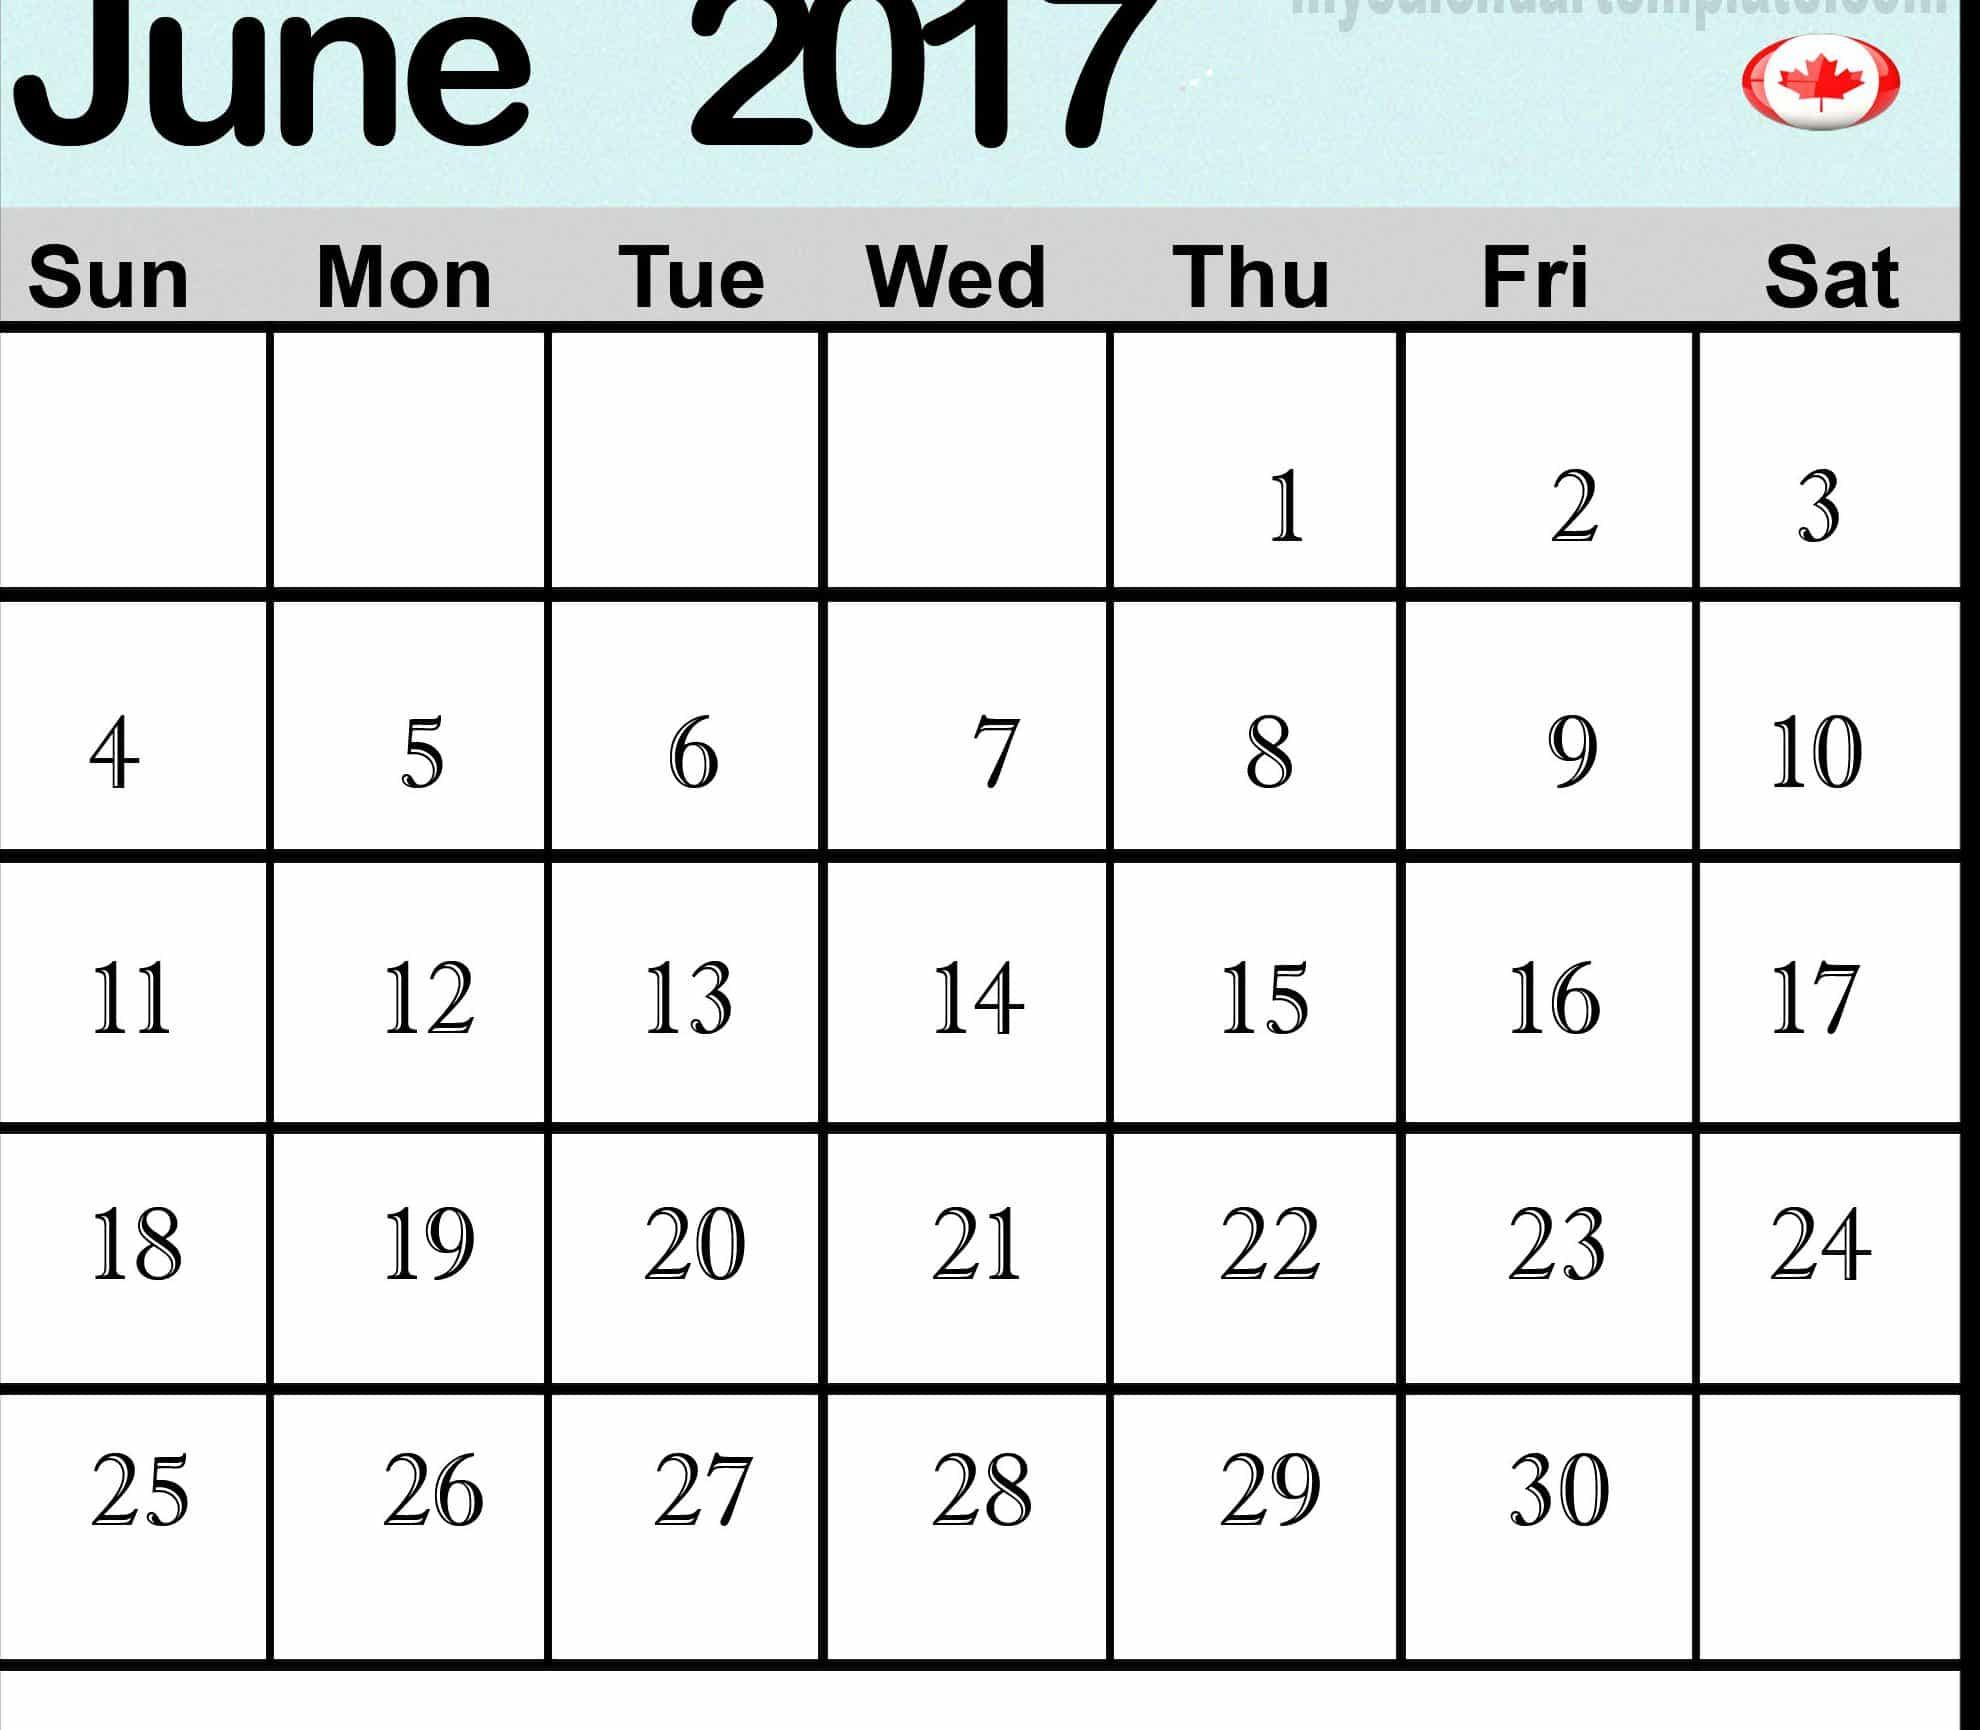 June 2017 calendar Image Canada